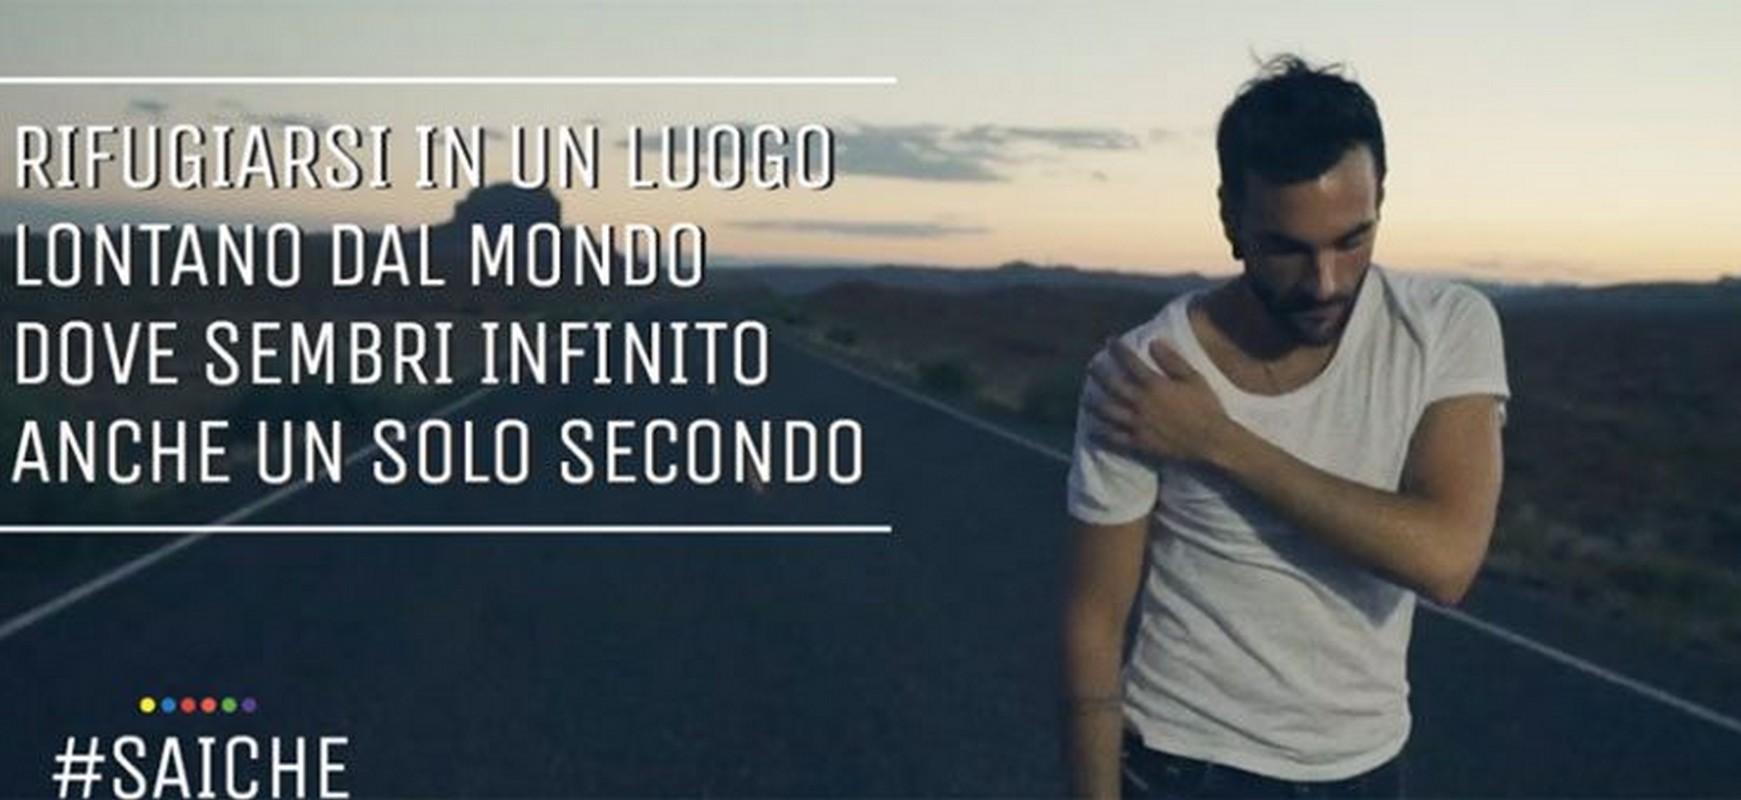 marco-mengoni-tracklist-740x340